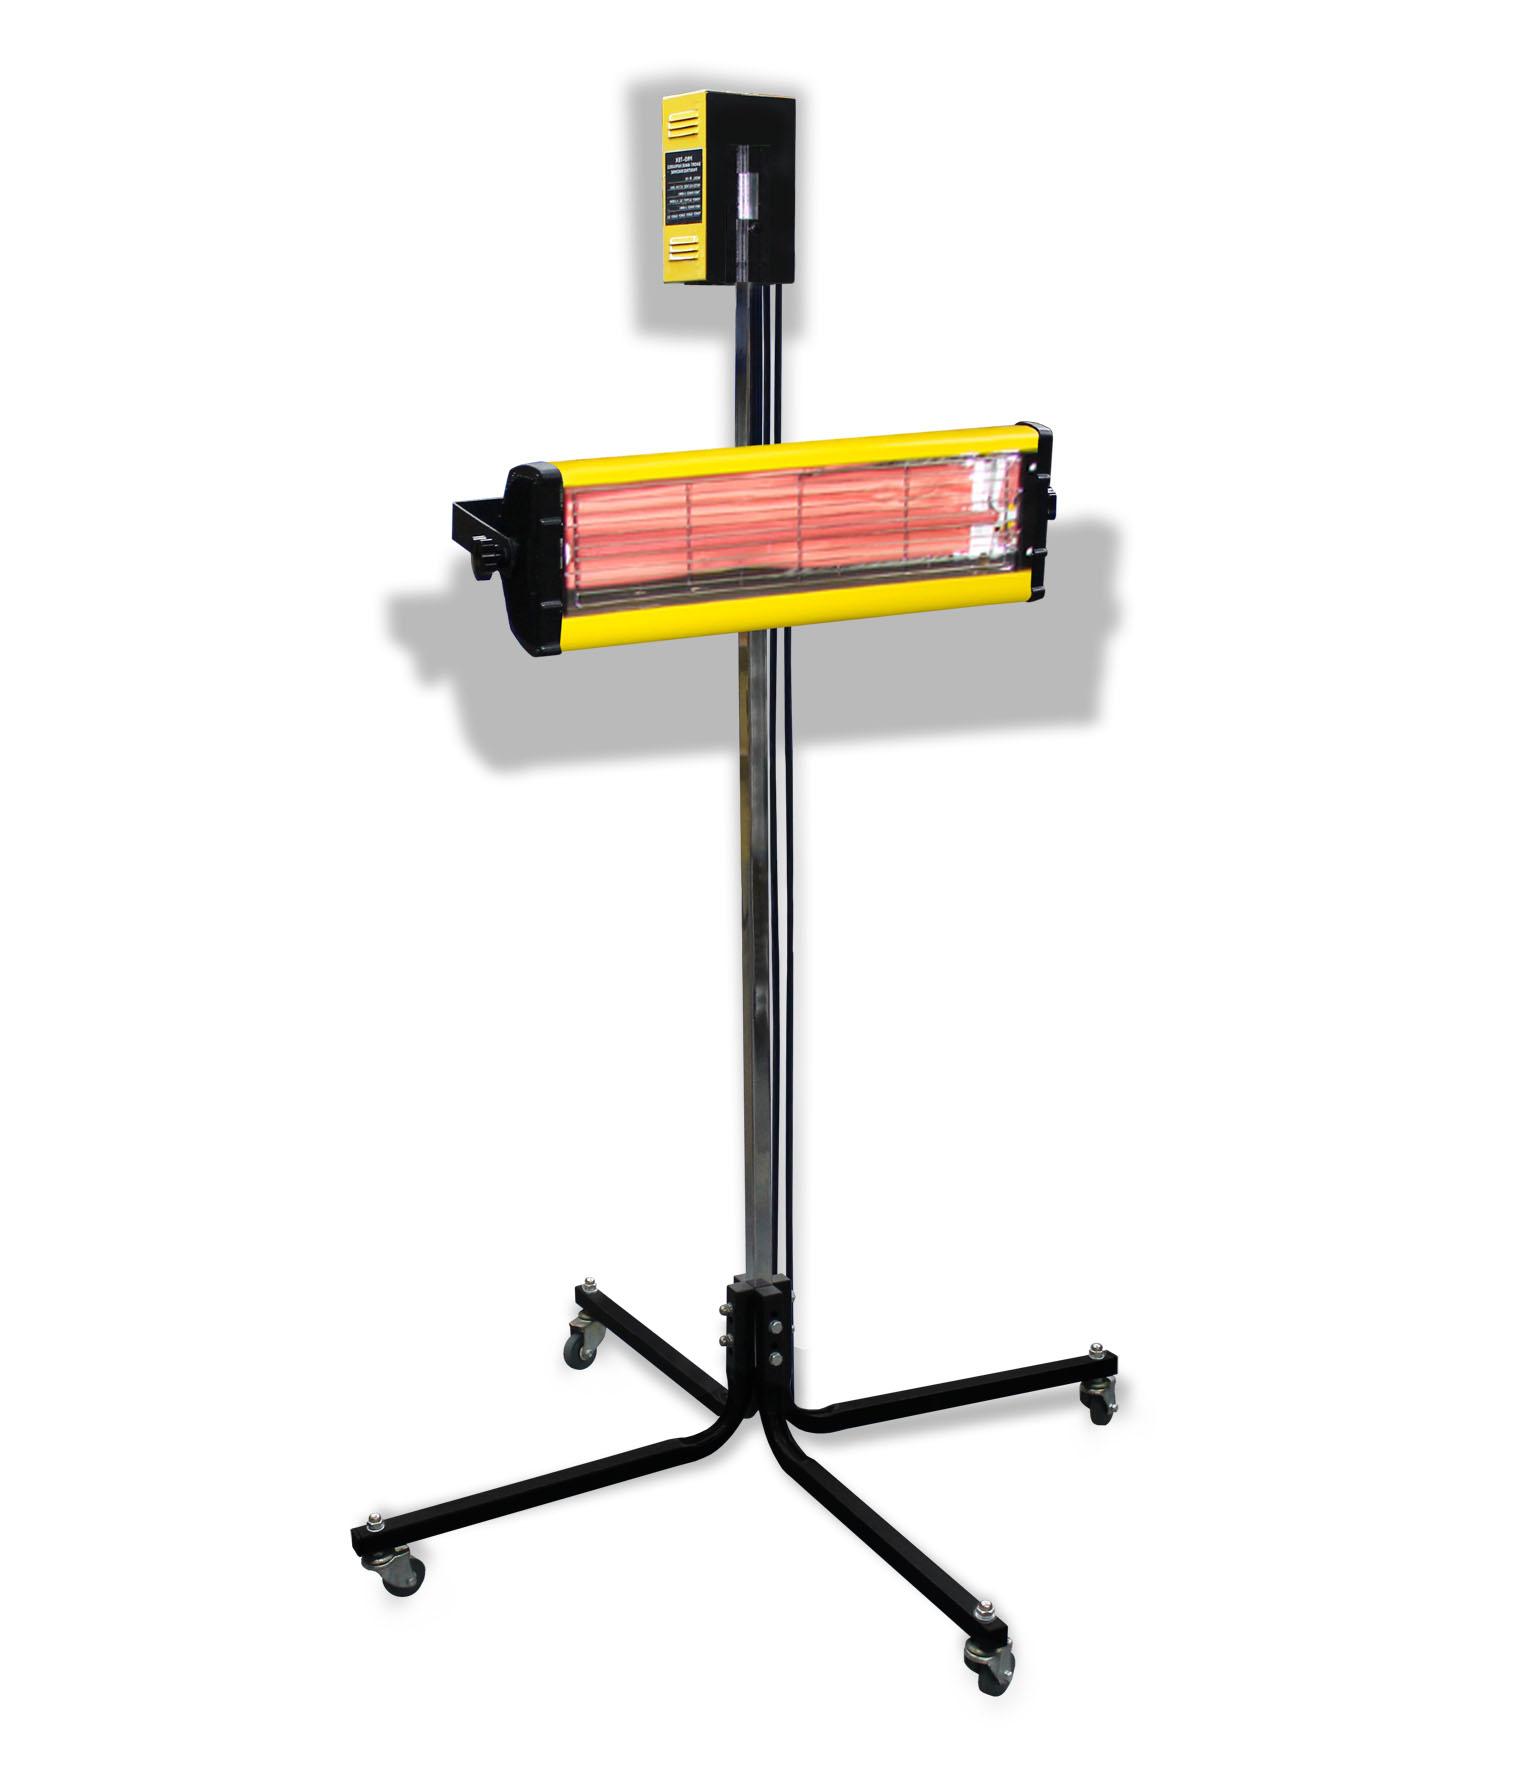 Short Waves Infrared Lamp Pro Teksprayequipment Com